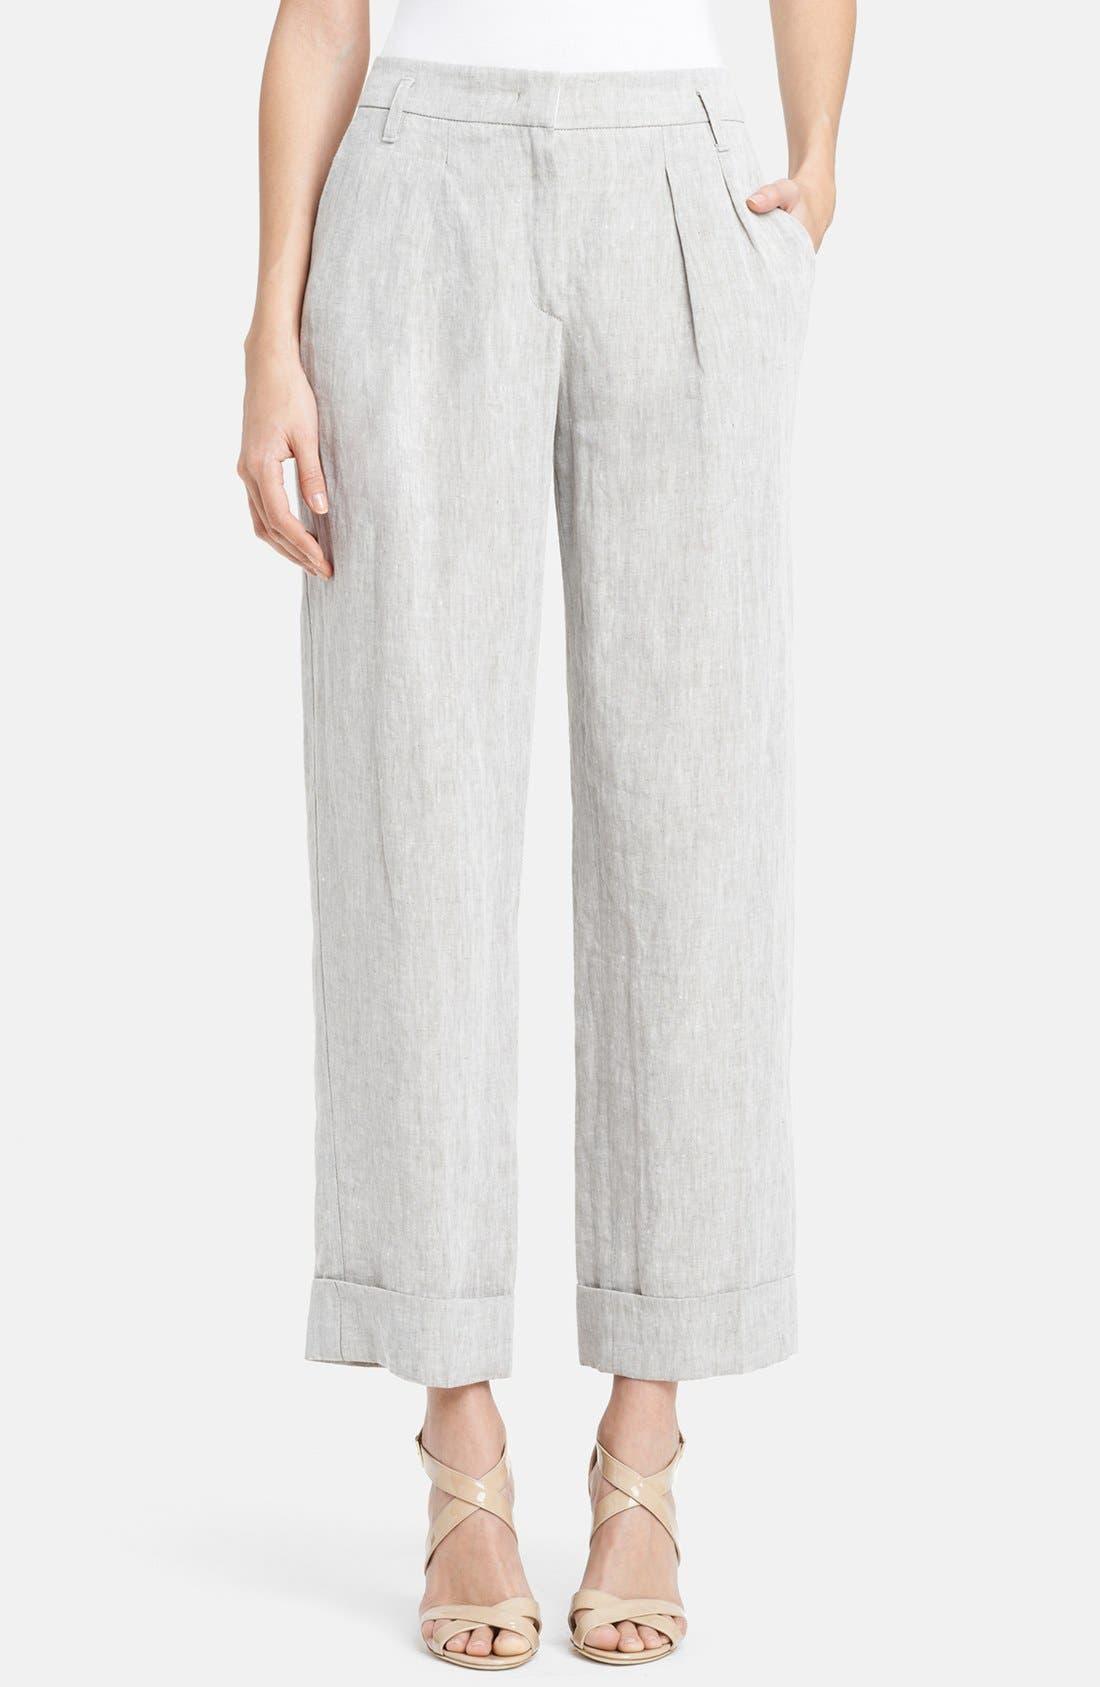 Alternate Image 1 Selected - Armani Collezioni Wide Crop Linen Pants